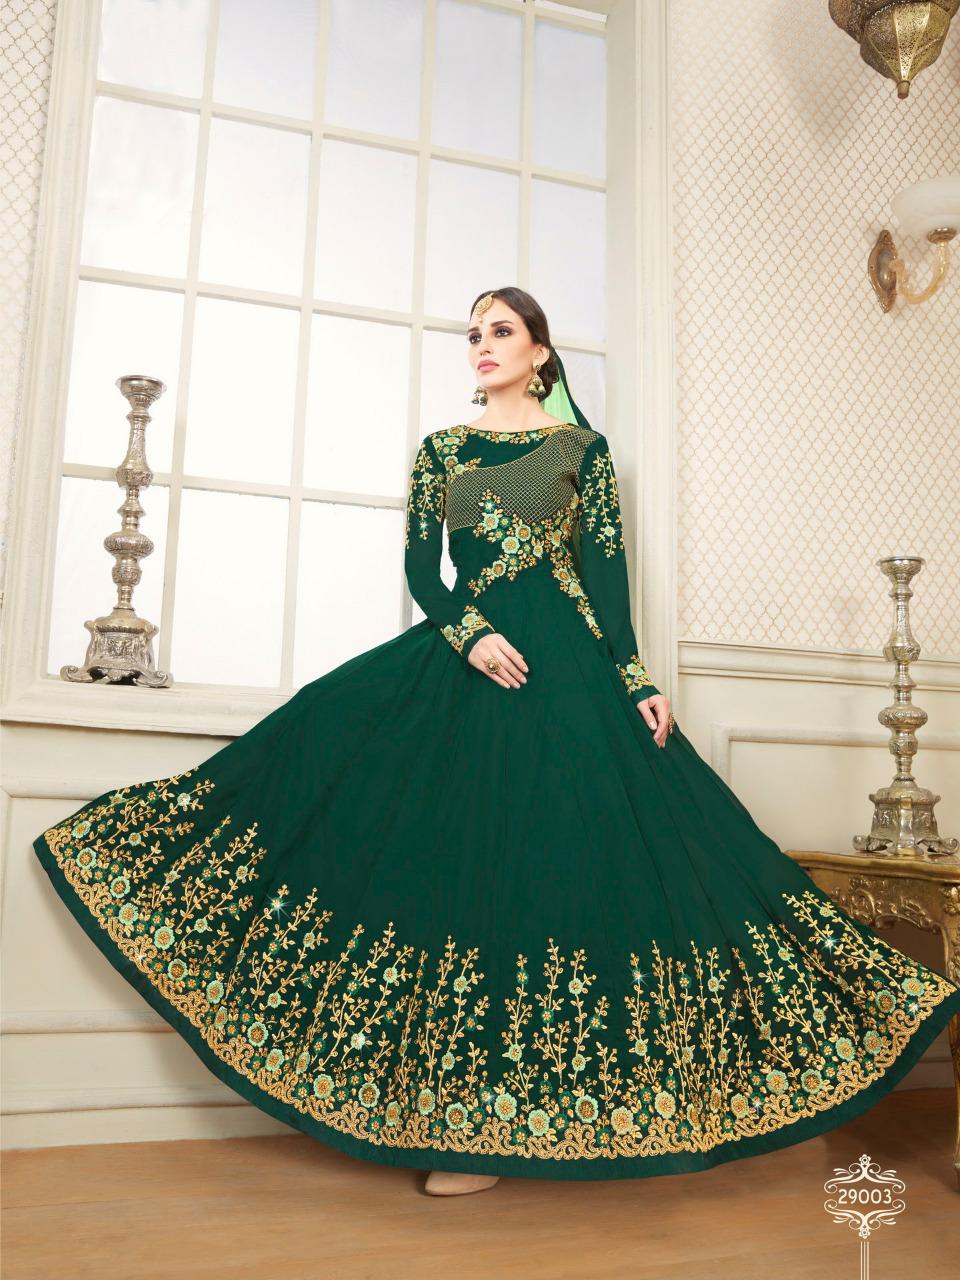 Mehak Fashion 29000 Series 29003